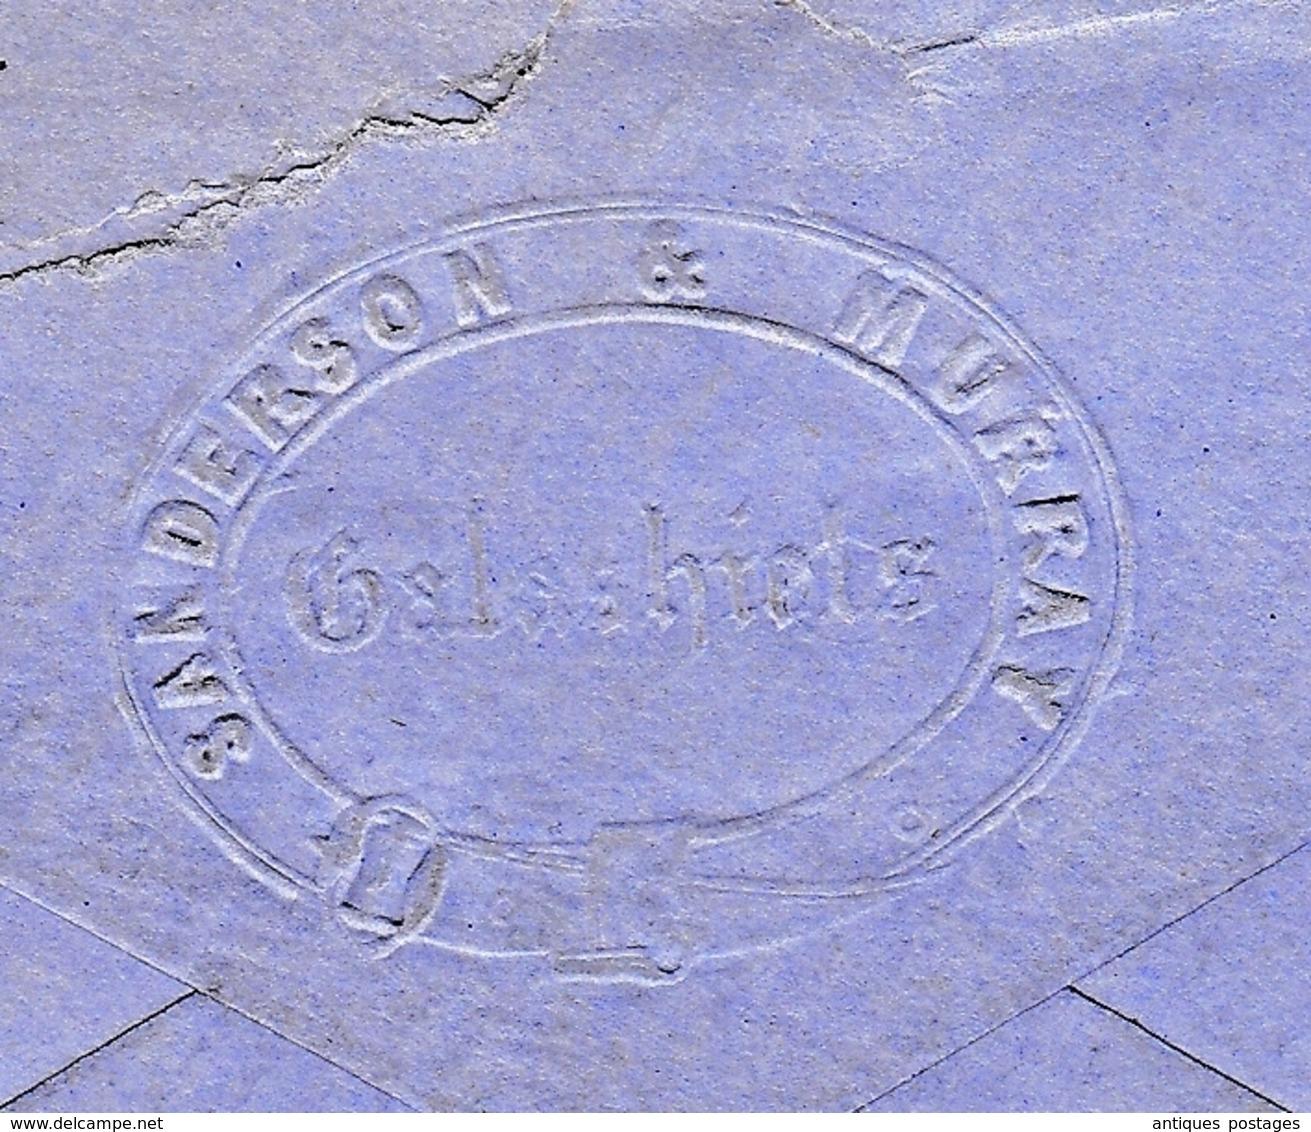 Lettre Galashiels 1877 Scotland Écosse England Sanderson & Murray Victoria Edinburg One Penny Red - 1840-1901 (Victoria)